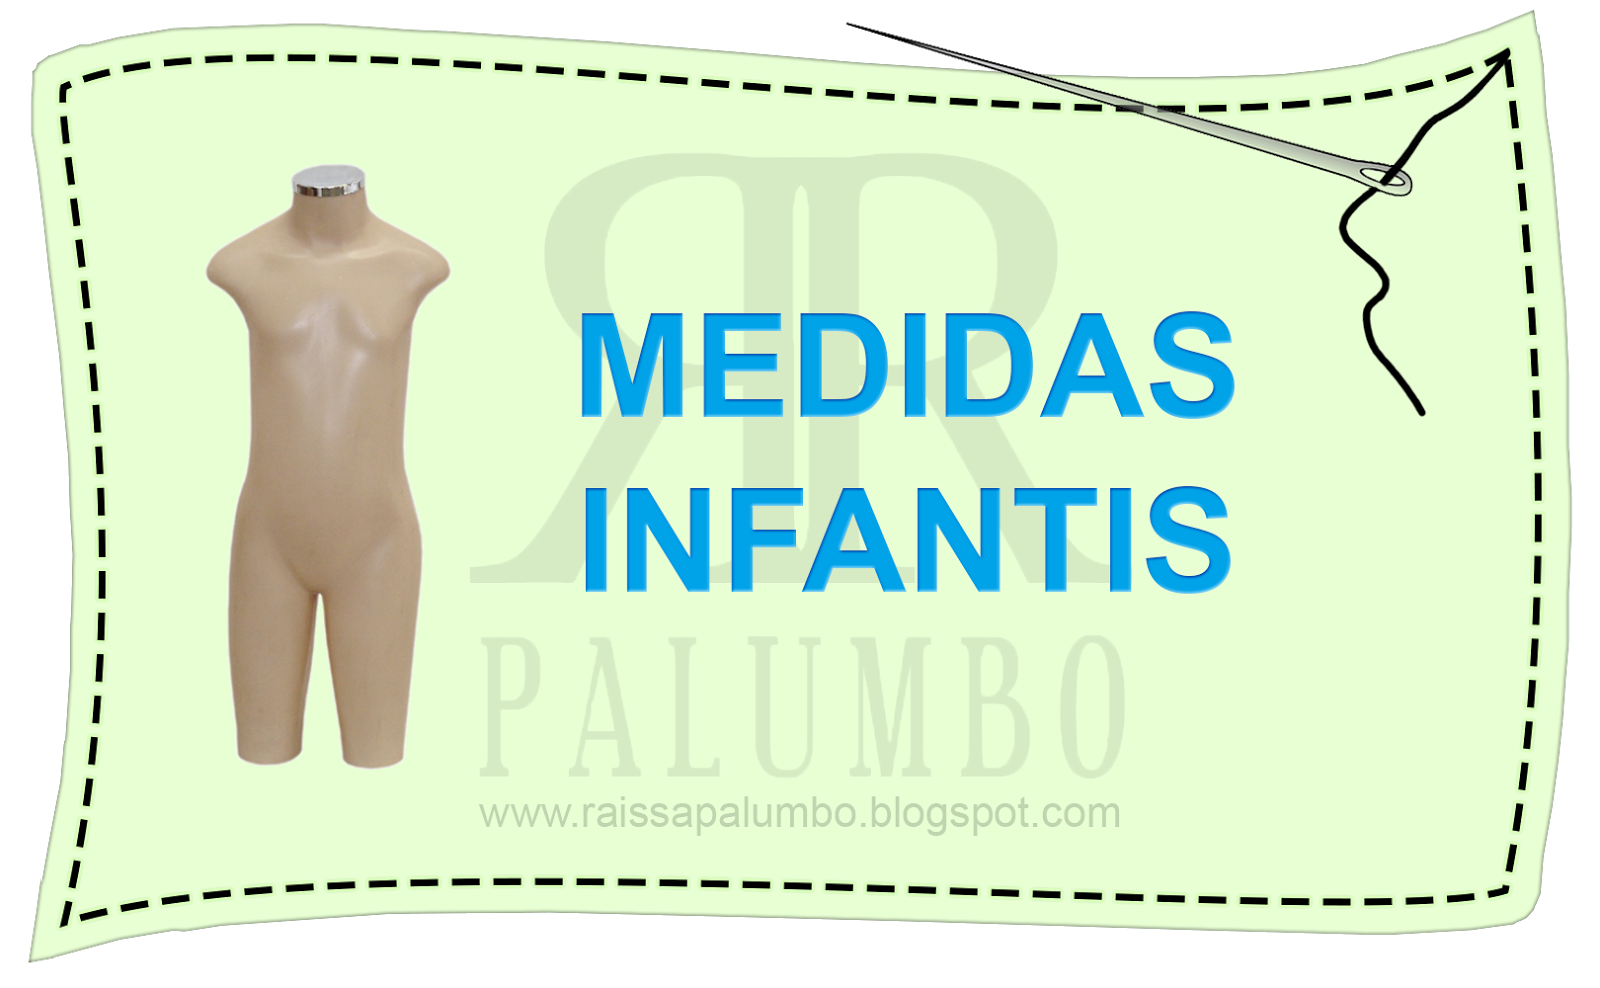 Ateli de costura ra ssa palumbo m dulo i t pico 3 for Medidas de mobiliario infantil